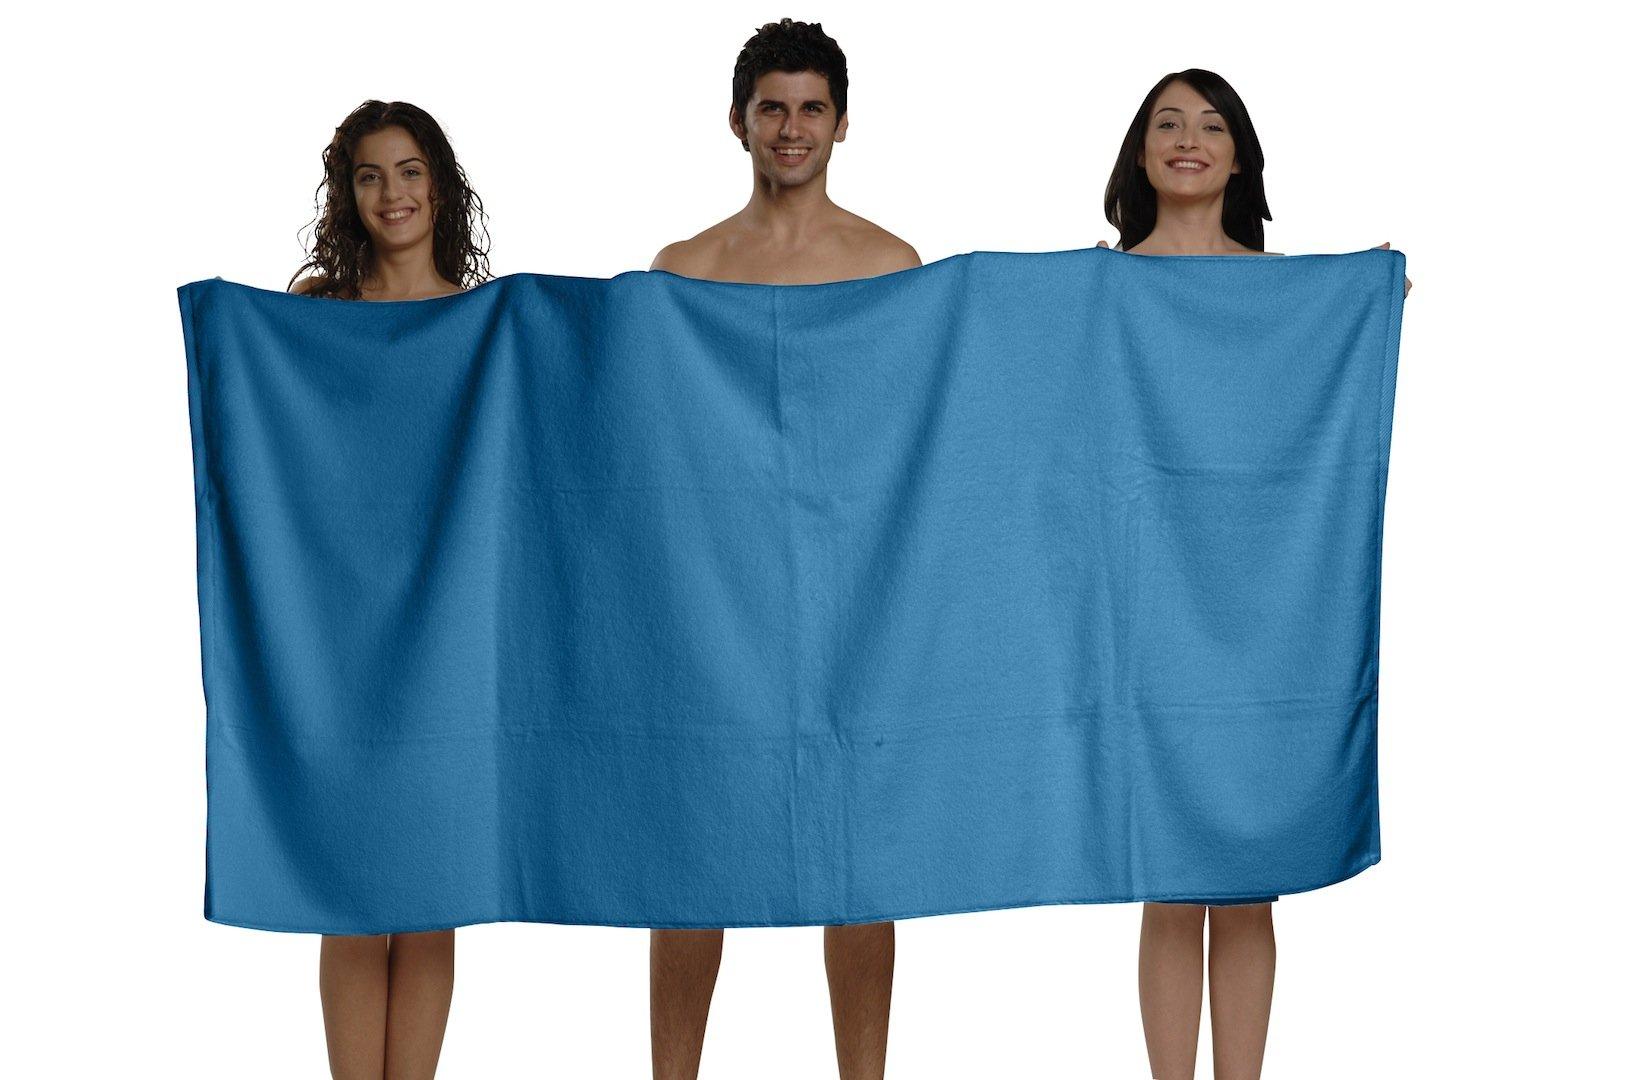 BUNDLE OF 6, 40''x80'', Turkish Spa Bath Sheet, 660 GSM. (BODRUM BLUE) by THIRSTY (Image #2)